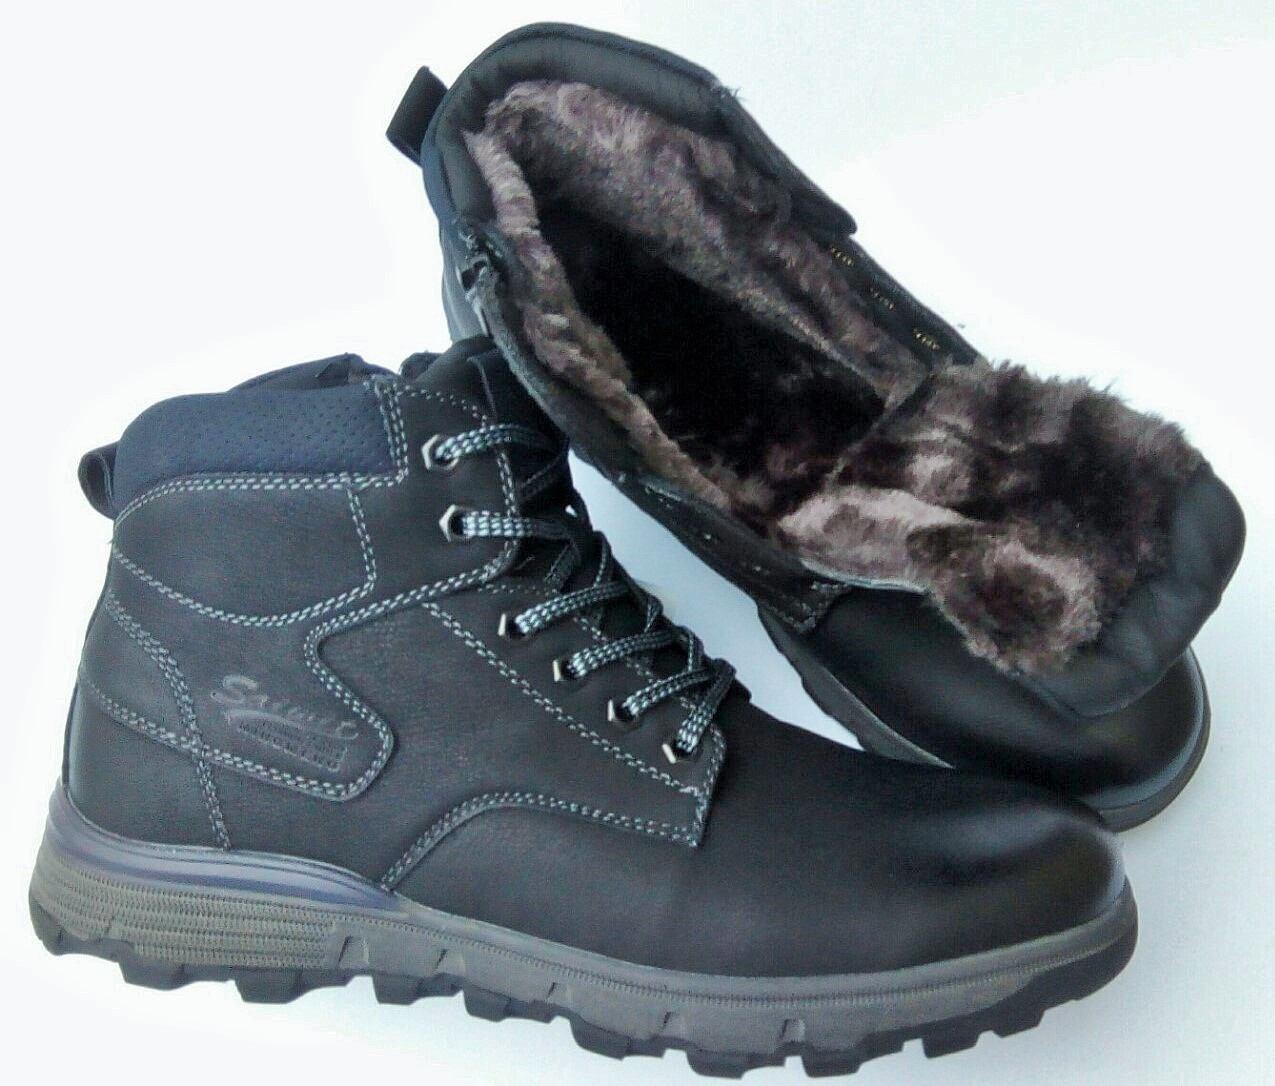 65555f64 Ботинки кроссовки зимние мужские р. 40, 41, 42, 43, 45, цена 985 грн ...